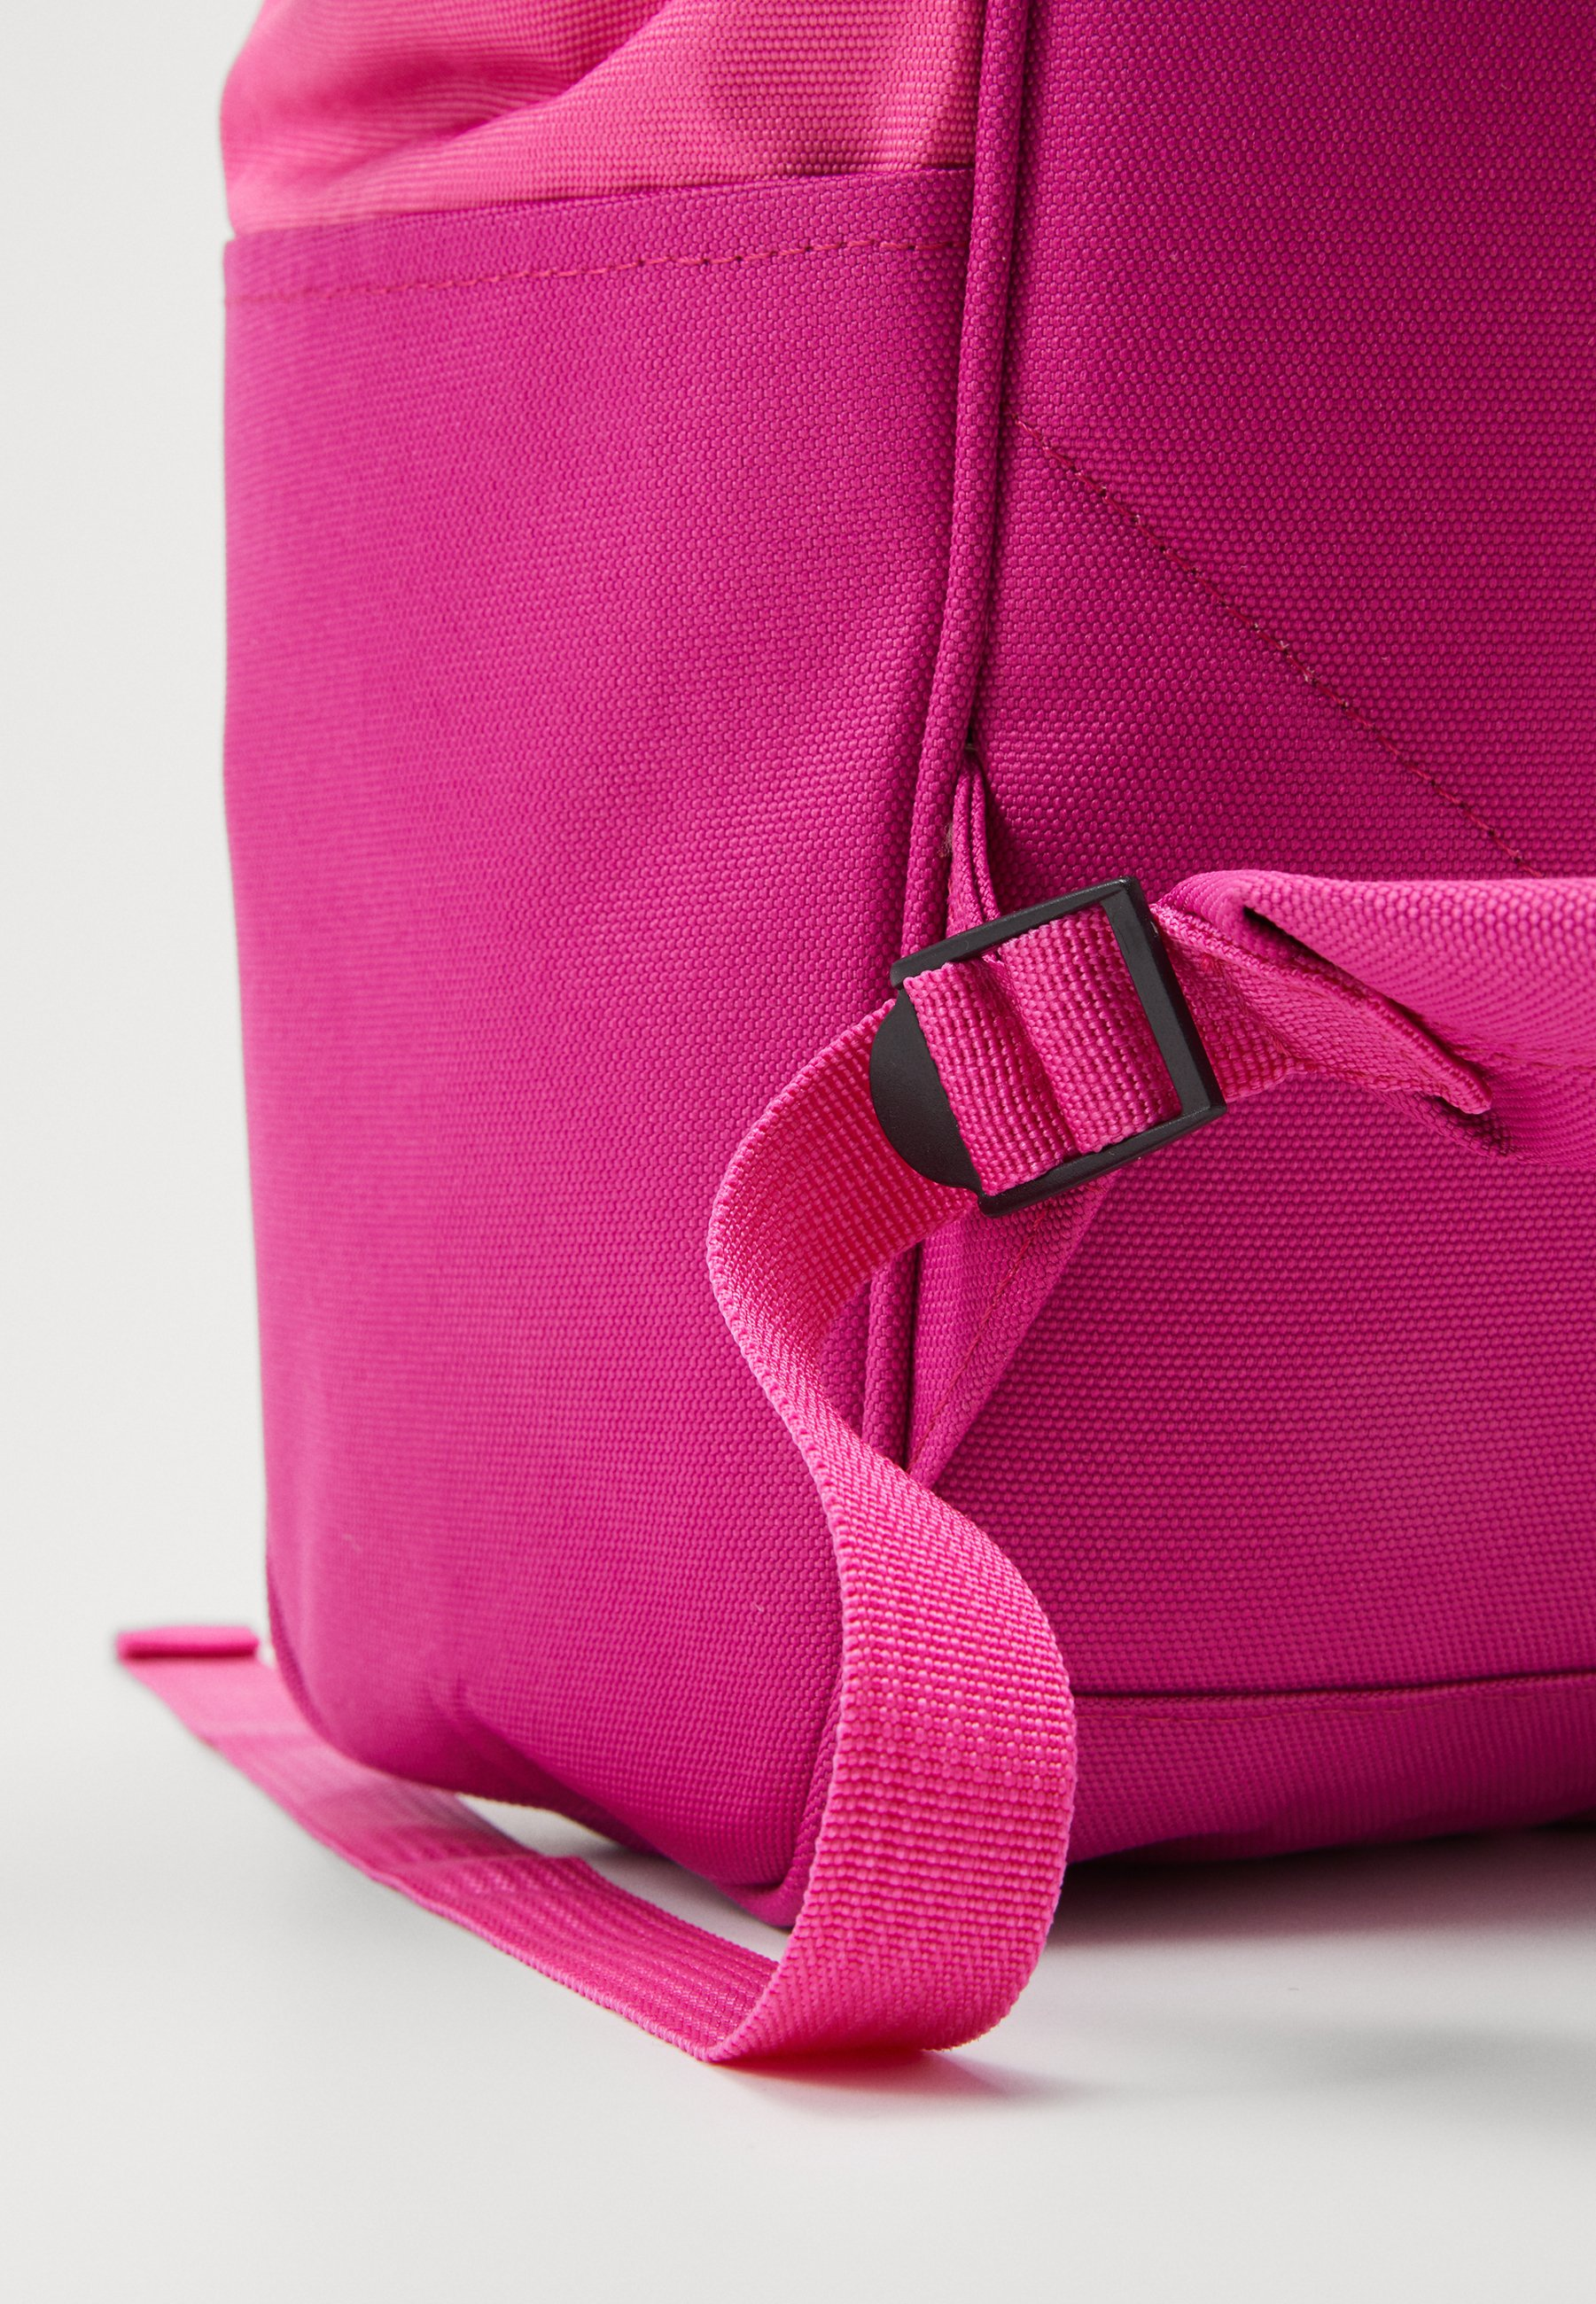 anello MINI - Ryggsekk - pink/rosa YVm6W7mnOcSyhh3